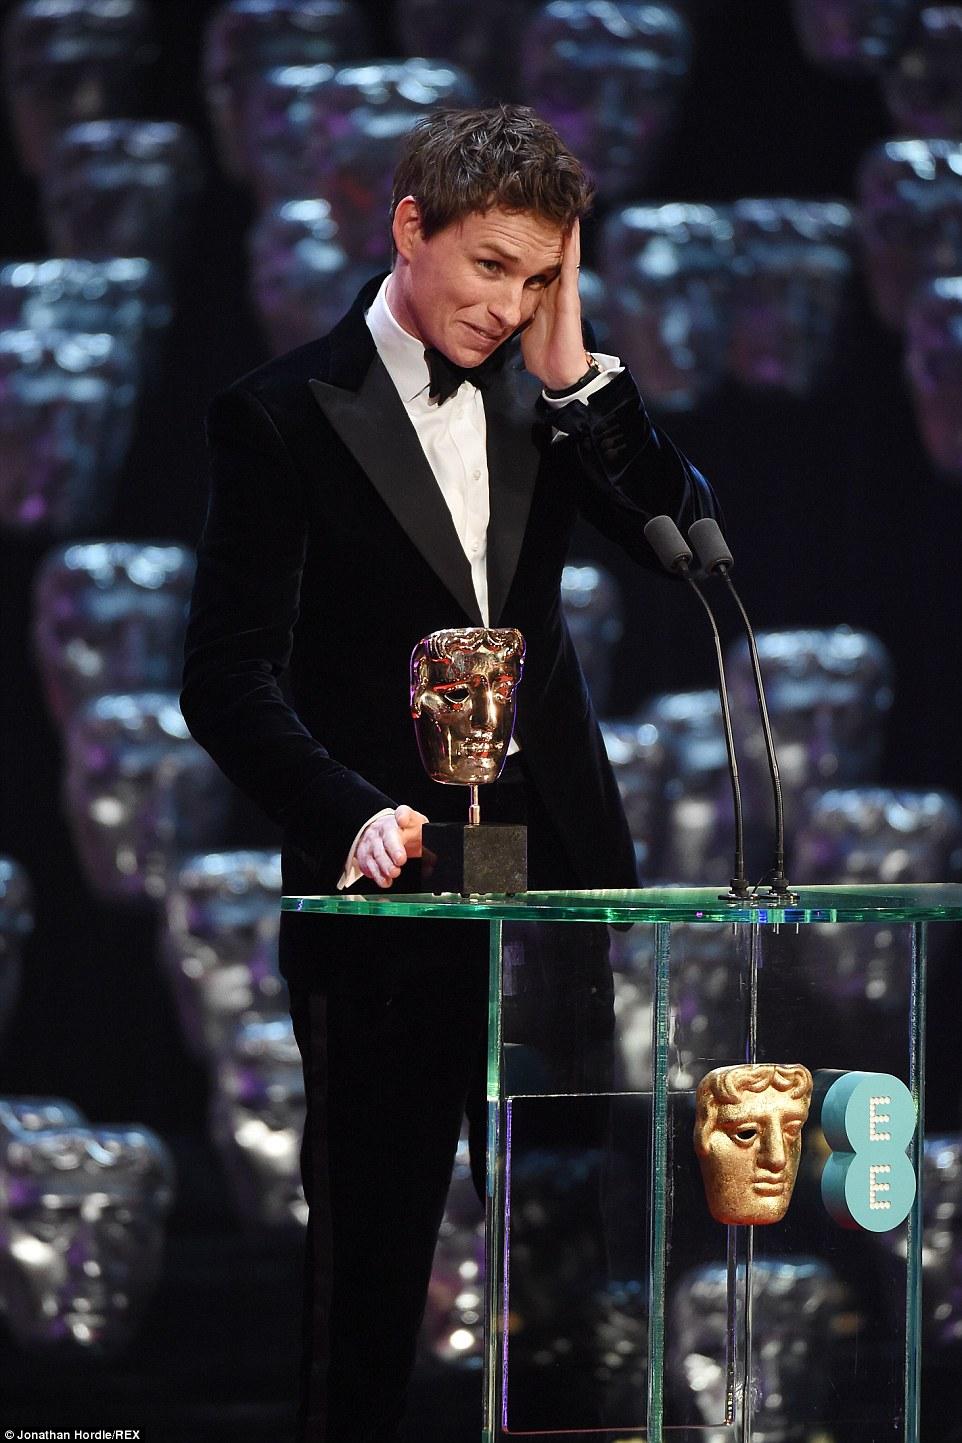 Eddie Redmayne at The BAFTA's